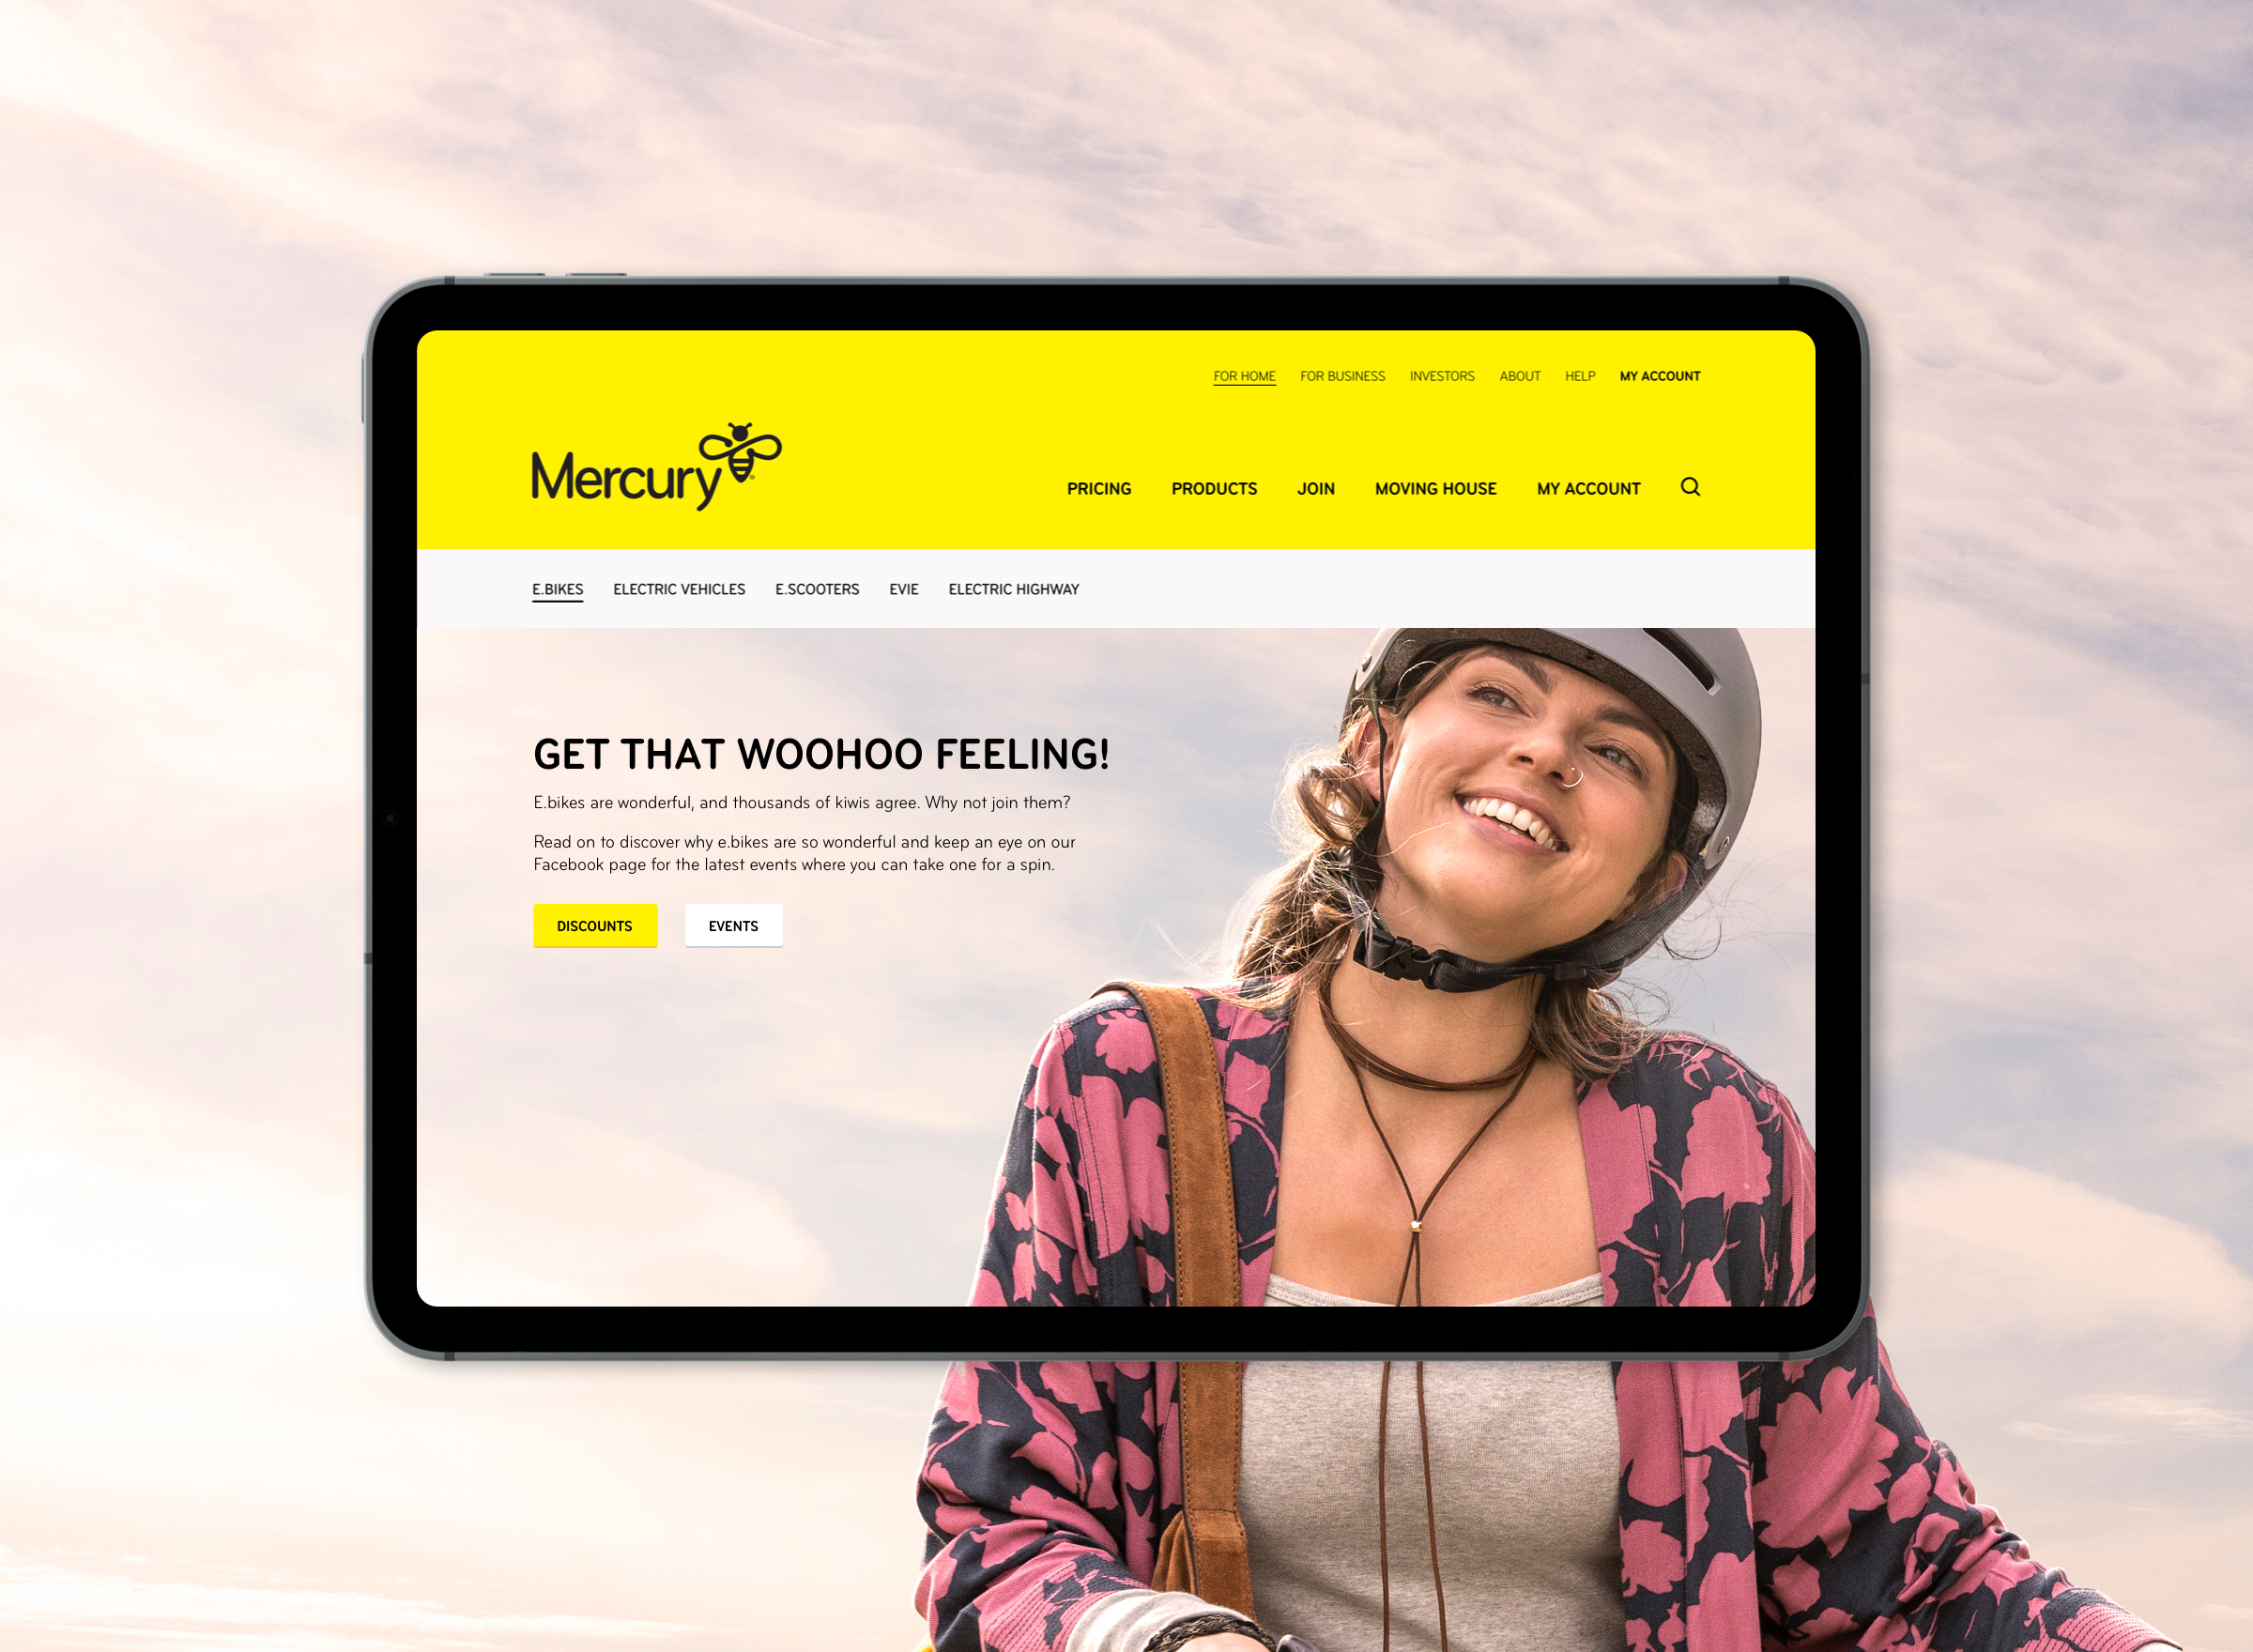 Mercury Website - E.bikes@2x.jpg